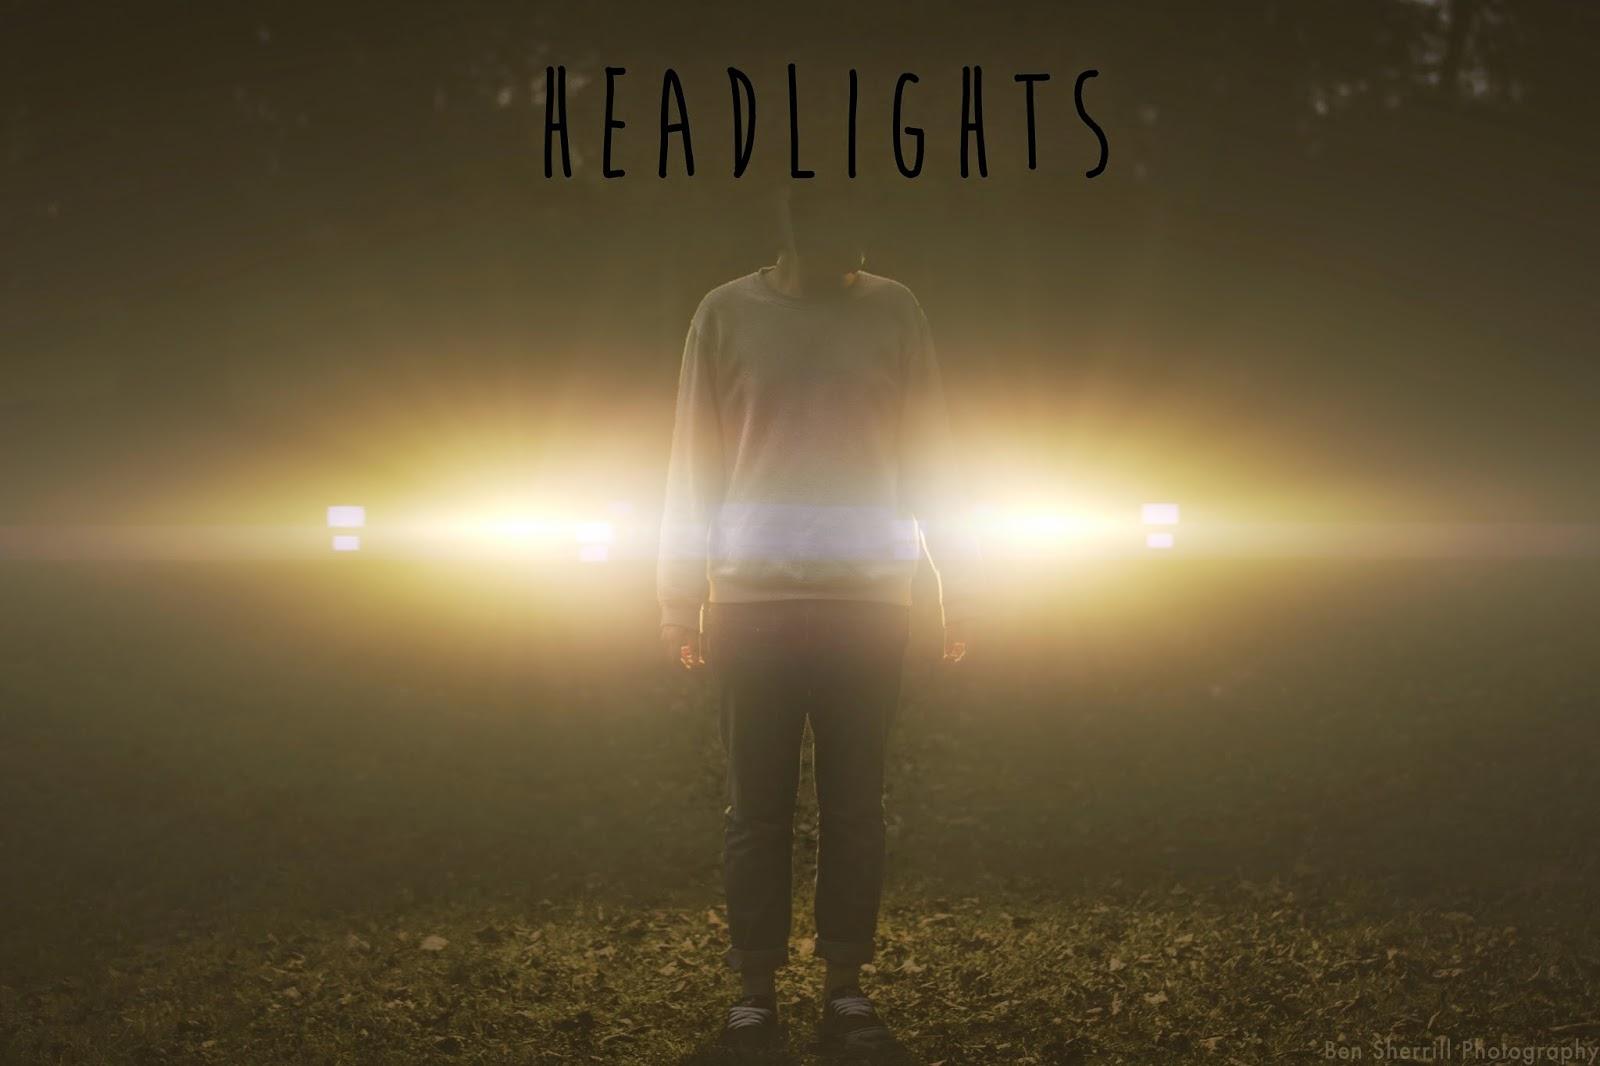 UNDUH Lagu Eminem - Headlights ft. Nate Ruess ] via Google Drive